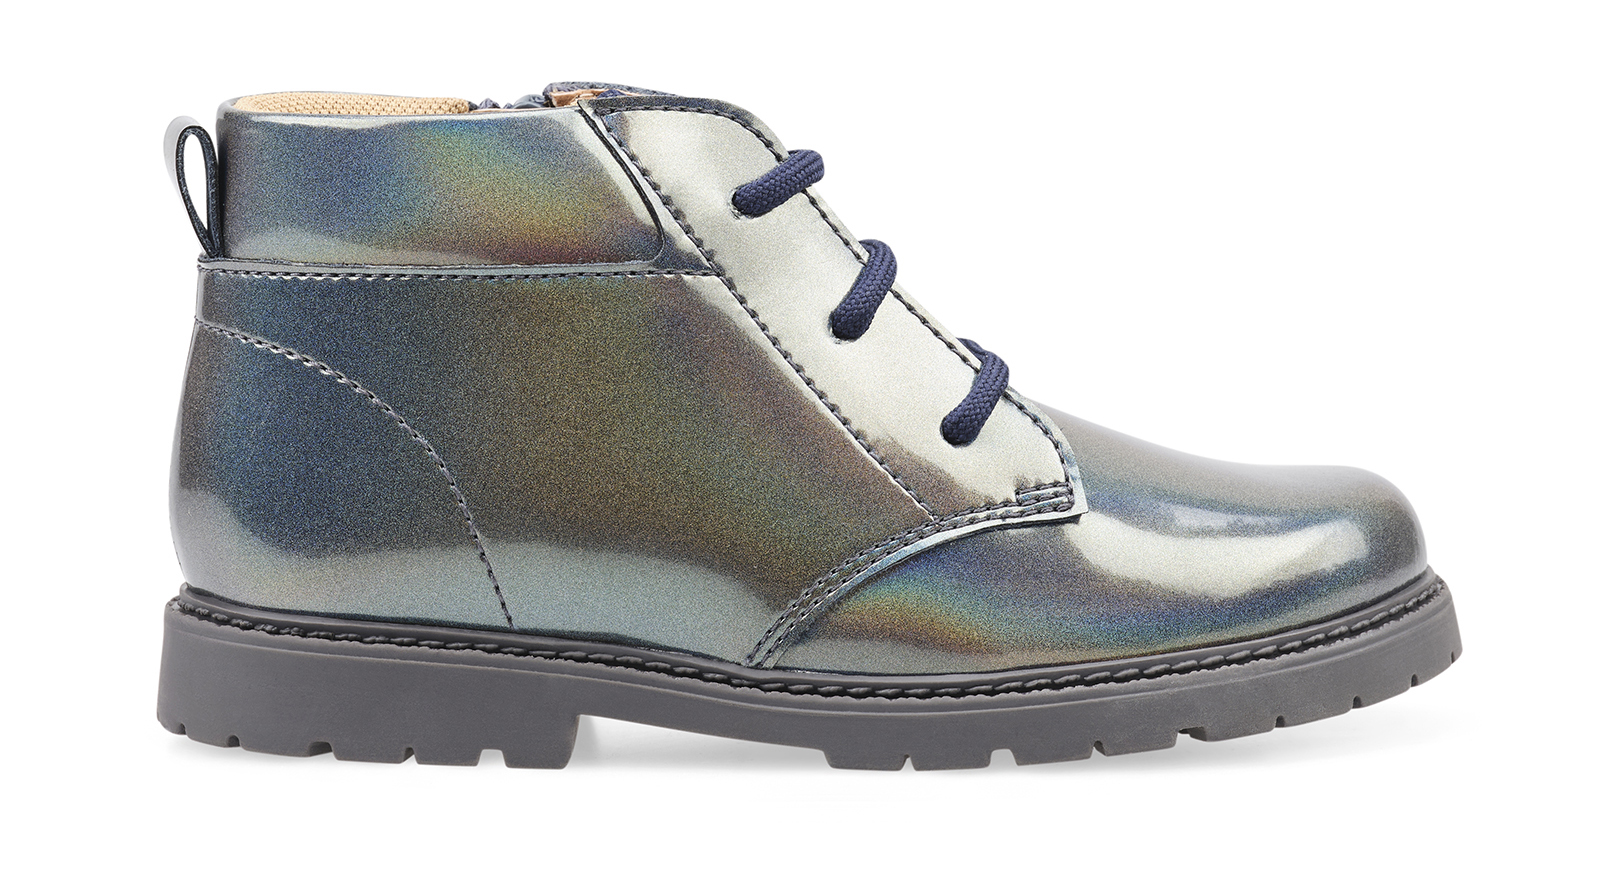 Wander boots